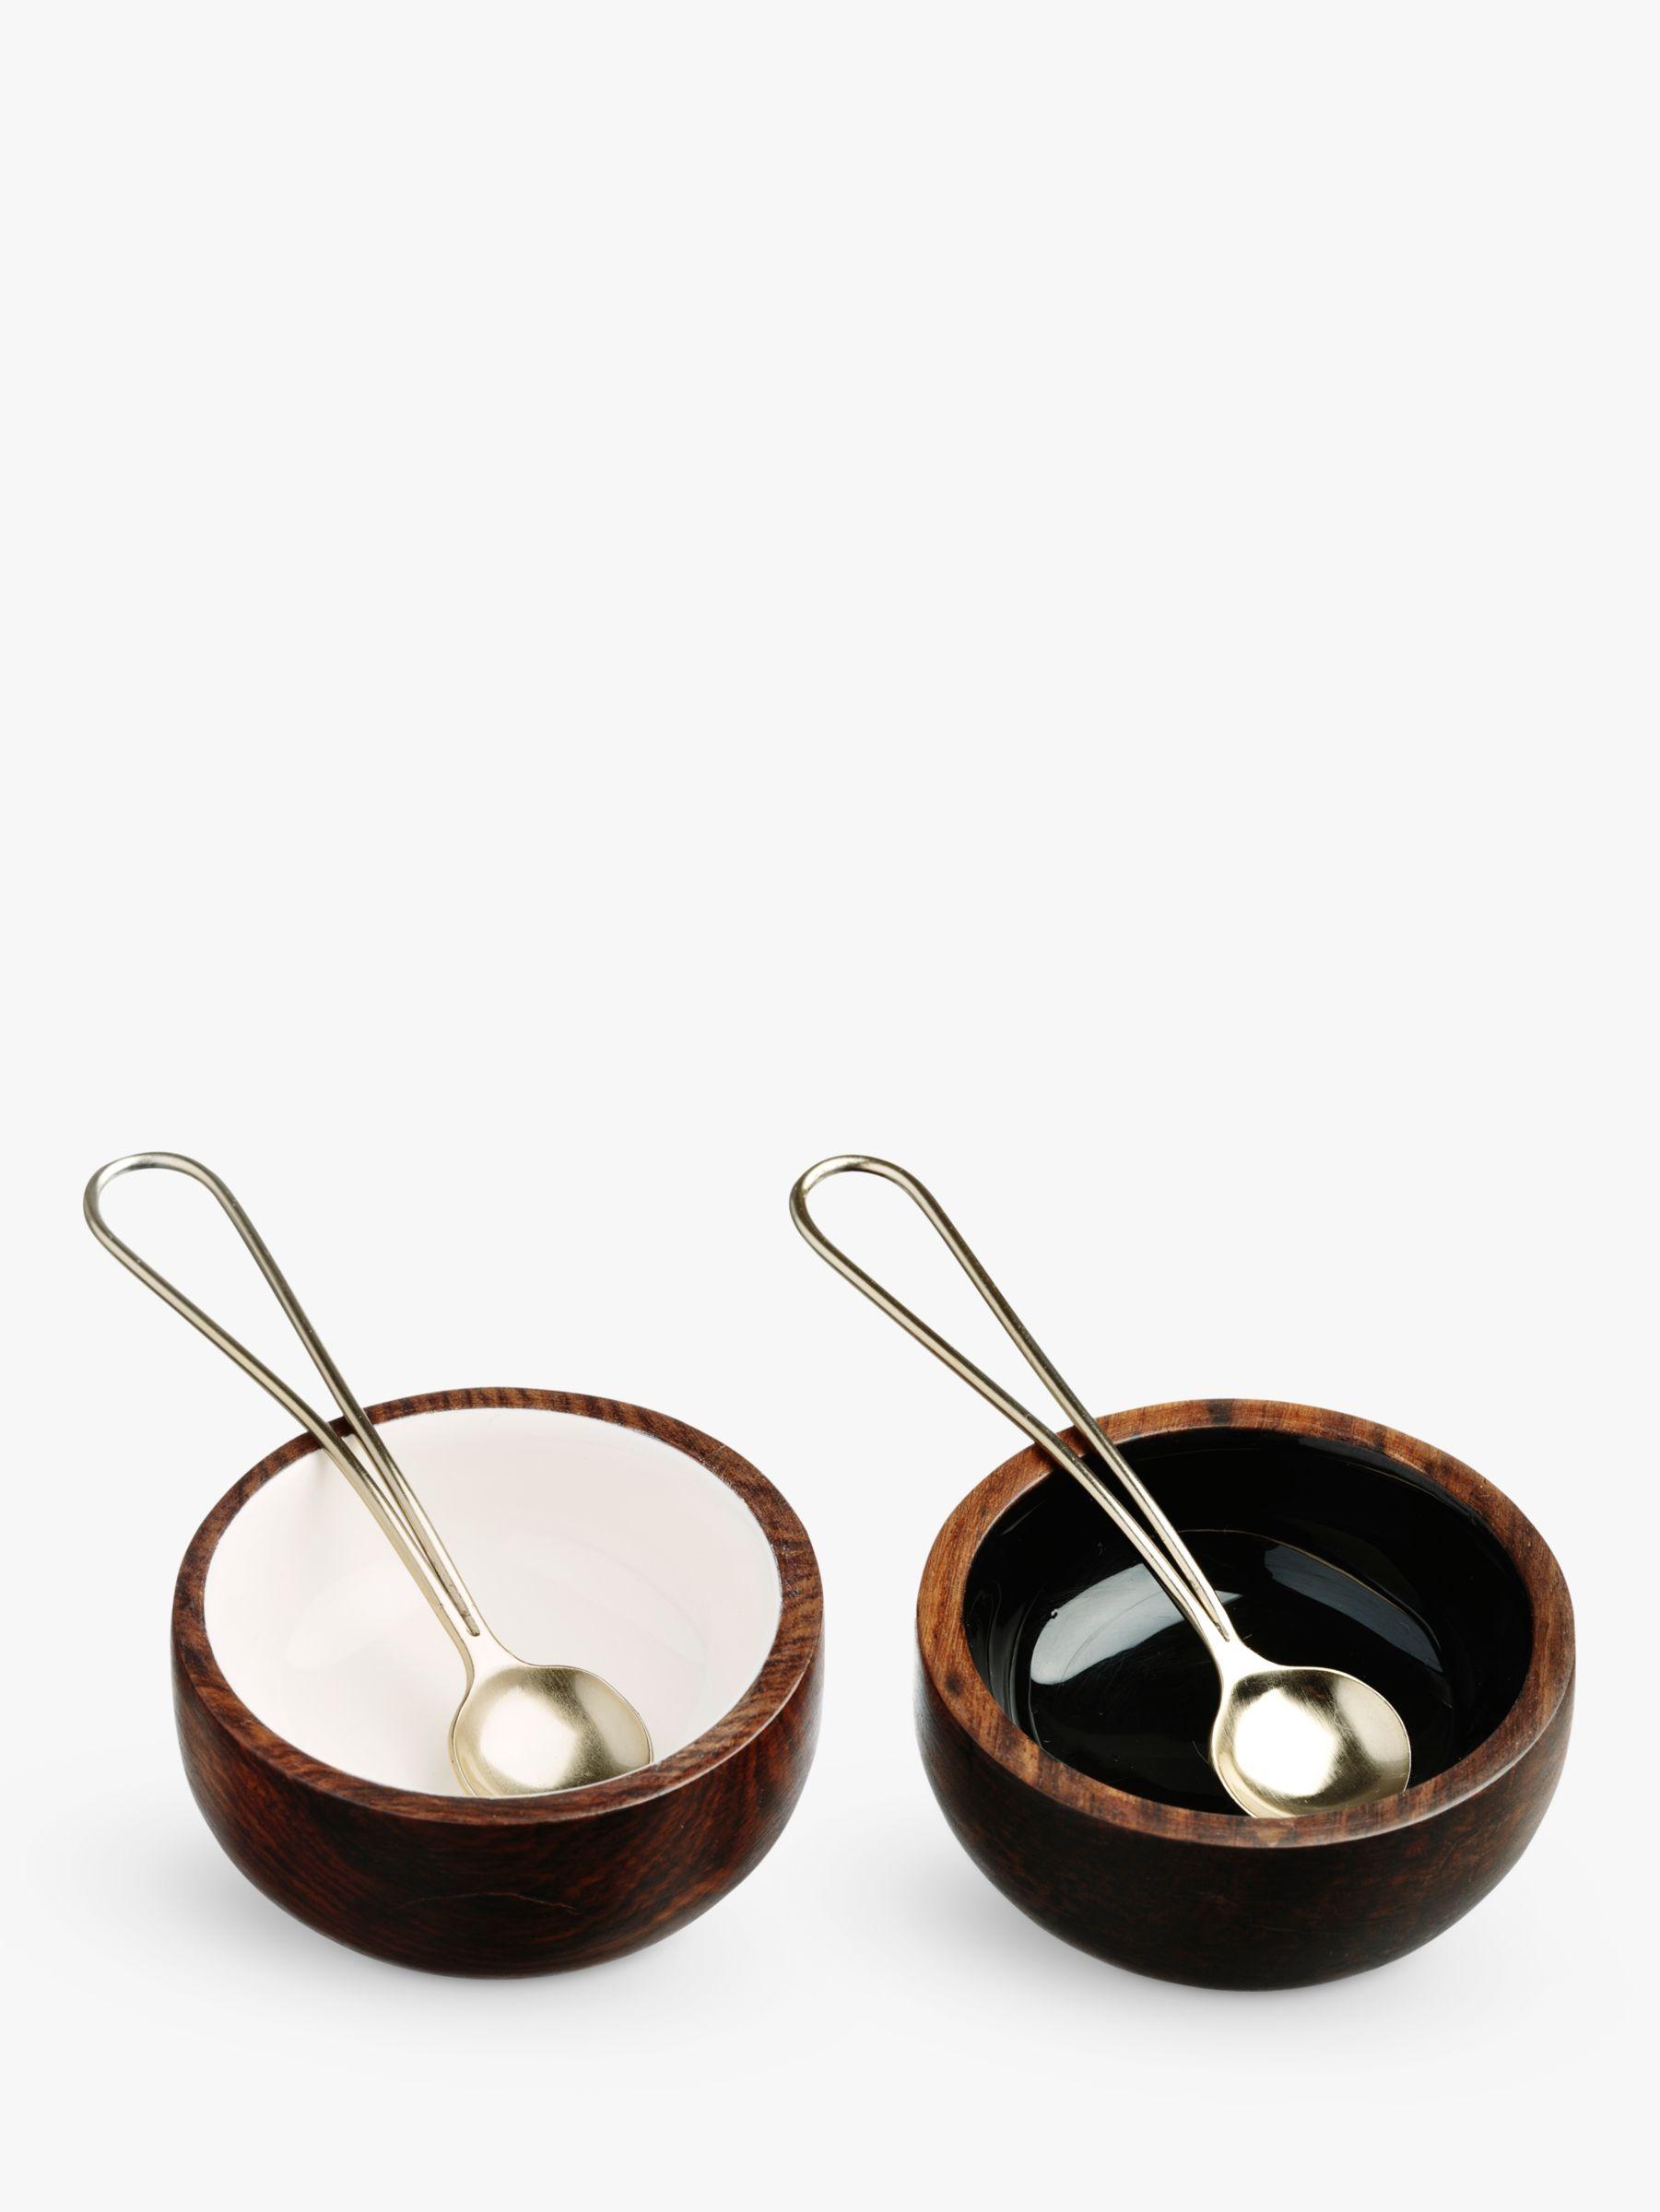 Just Slate Just Slate Bowls & Spoons, Set of 2